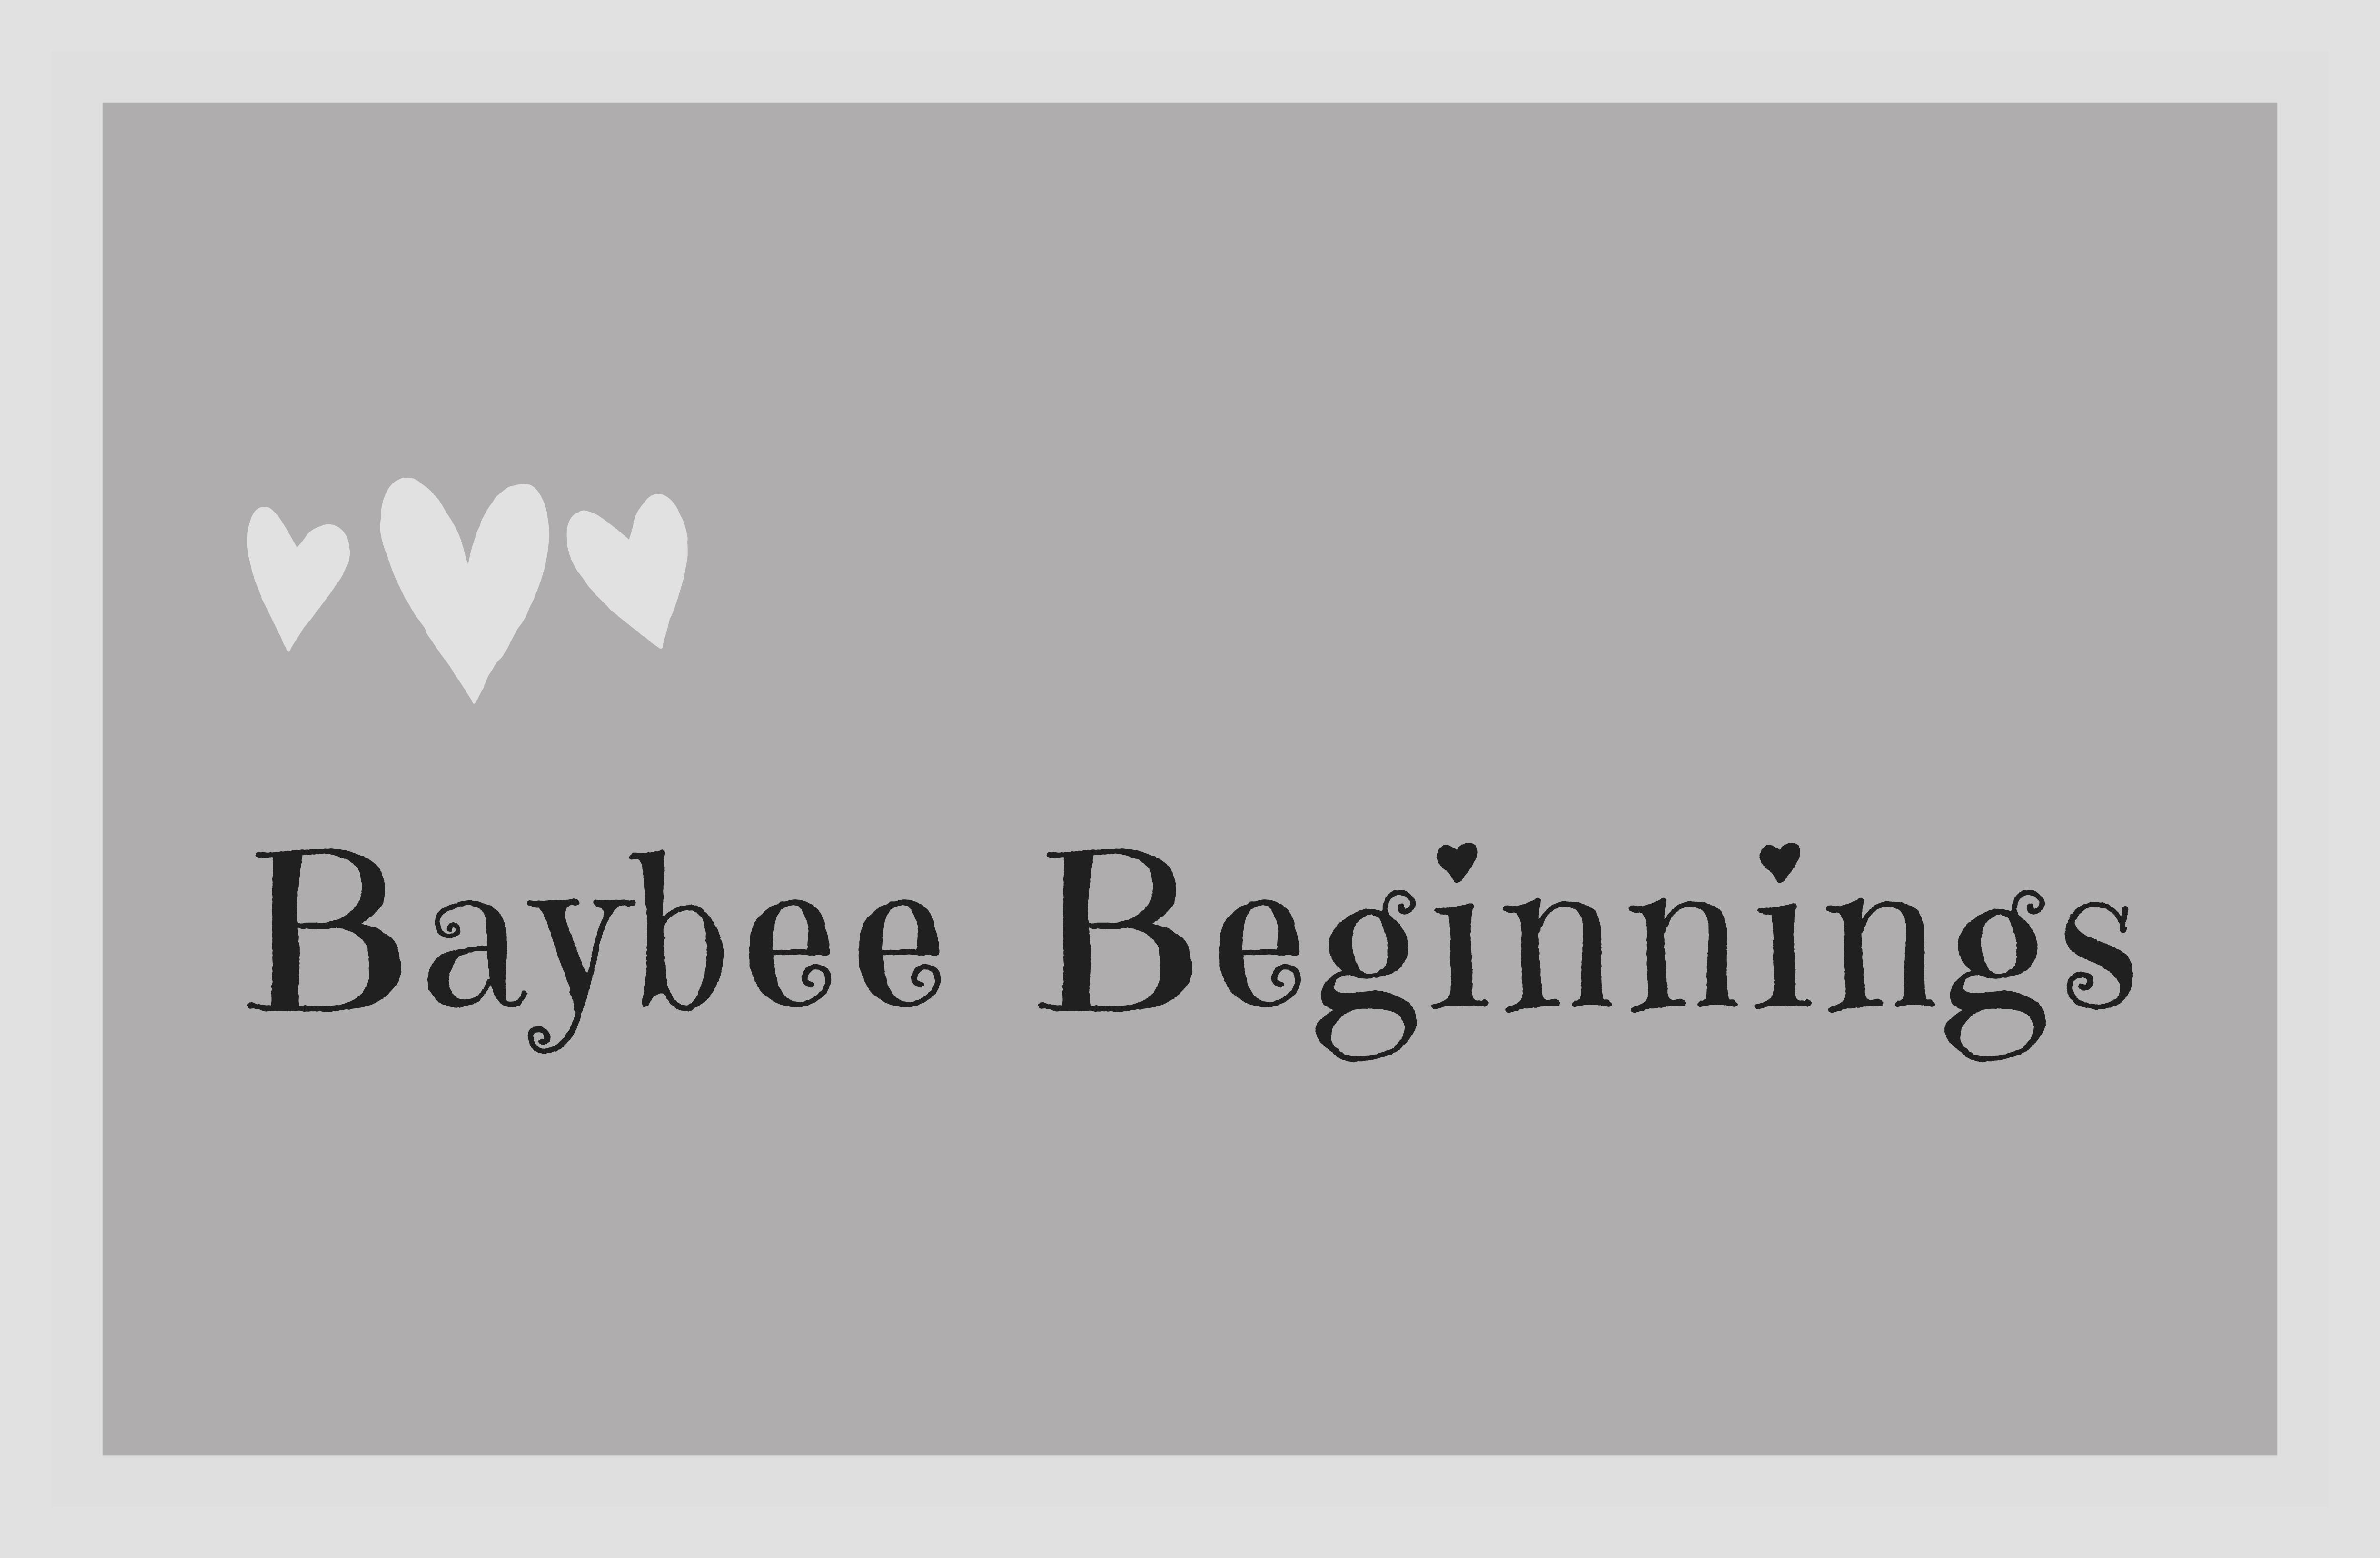 Baybee Beginnings's logo